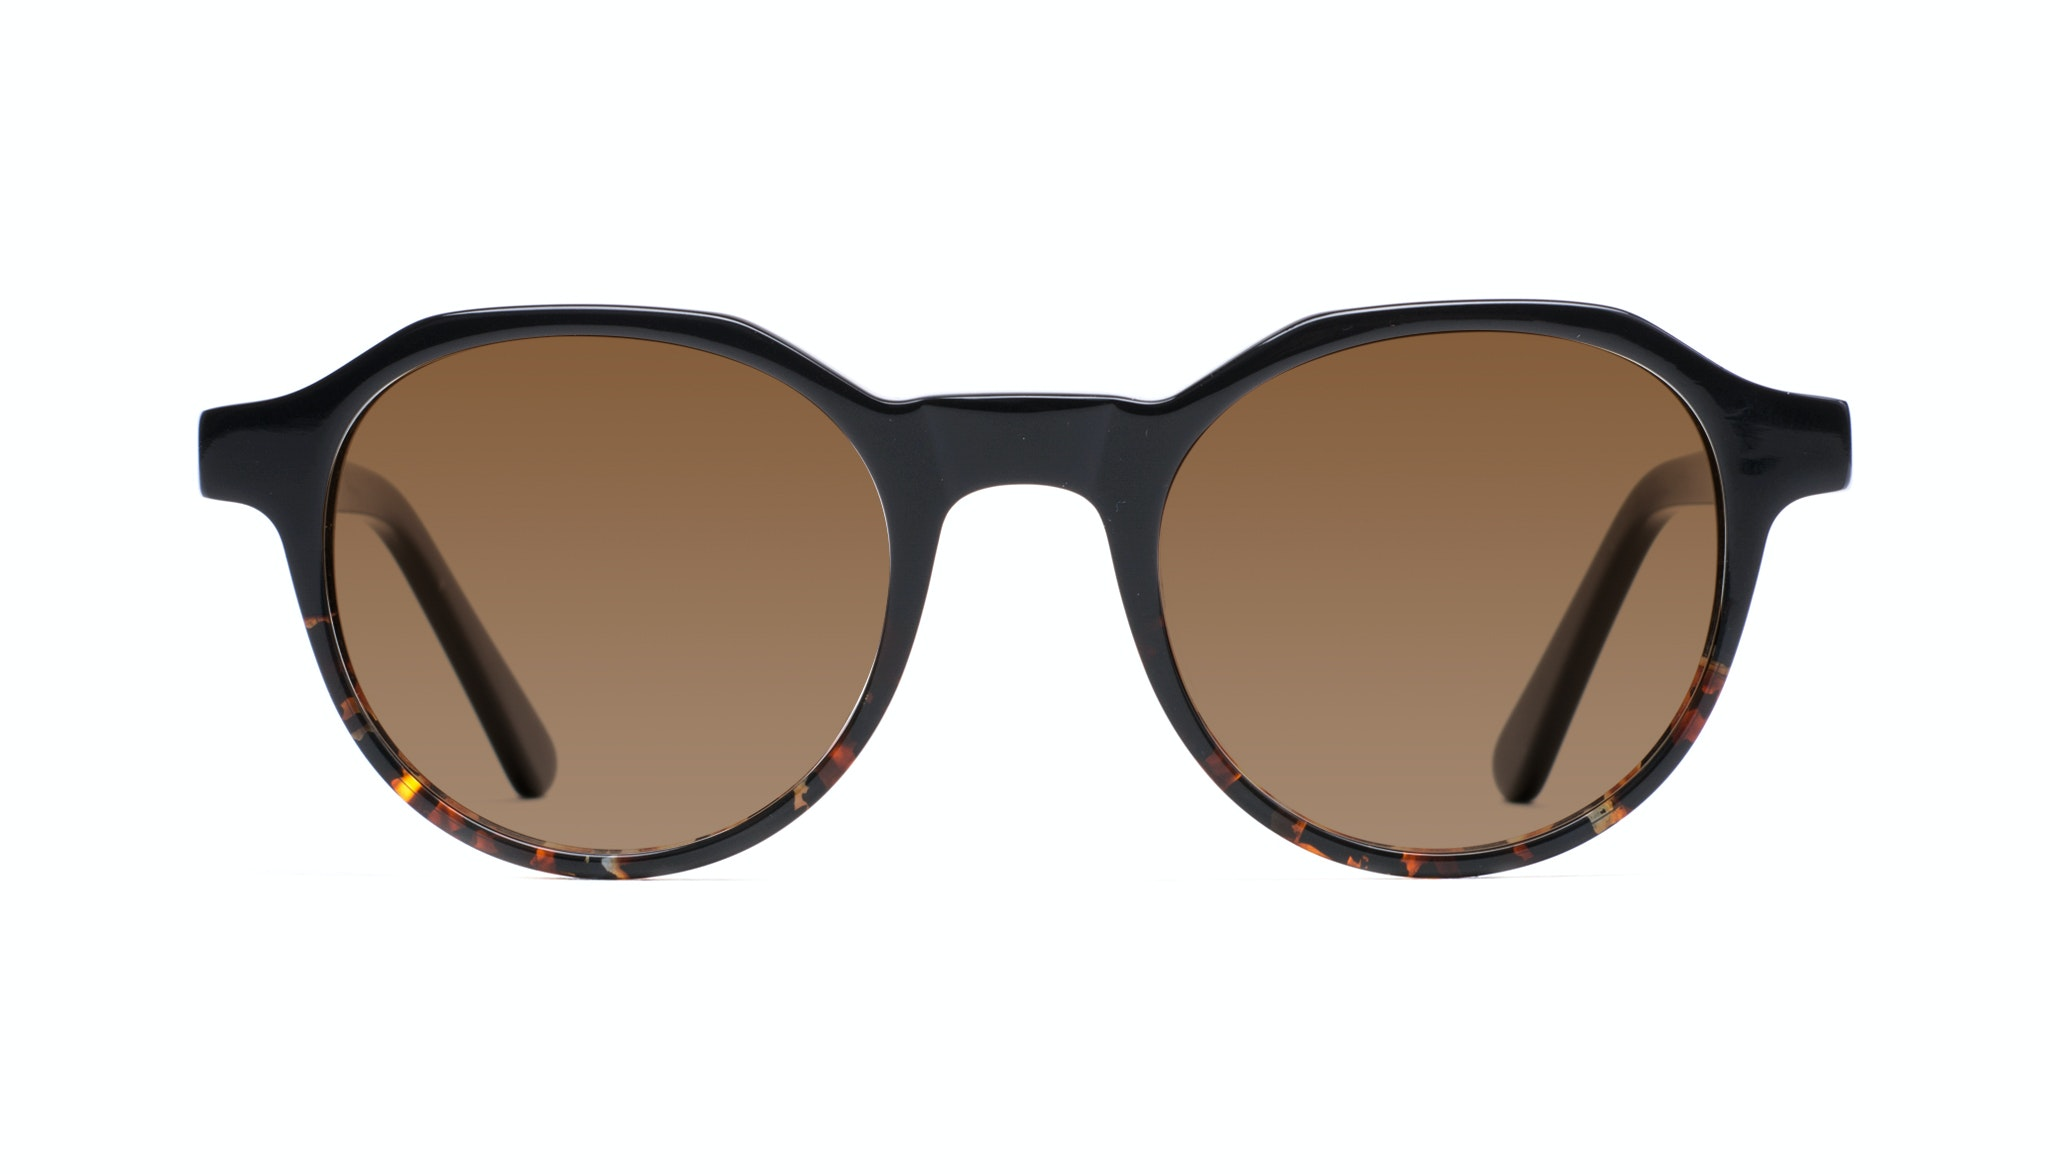 Affordable Fashion Glasses Round Sunglasses Men Form Black Mahogany Front